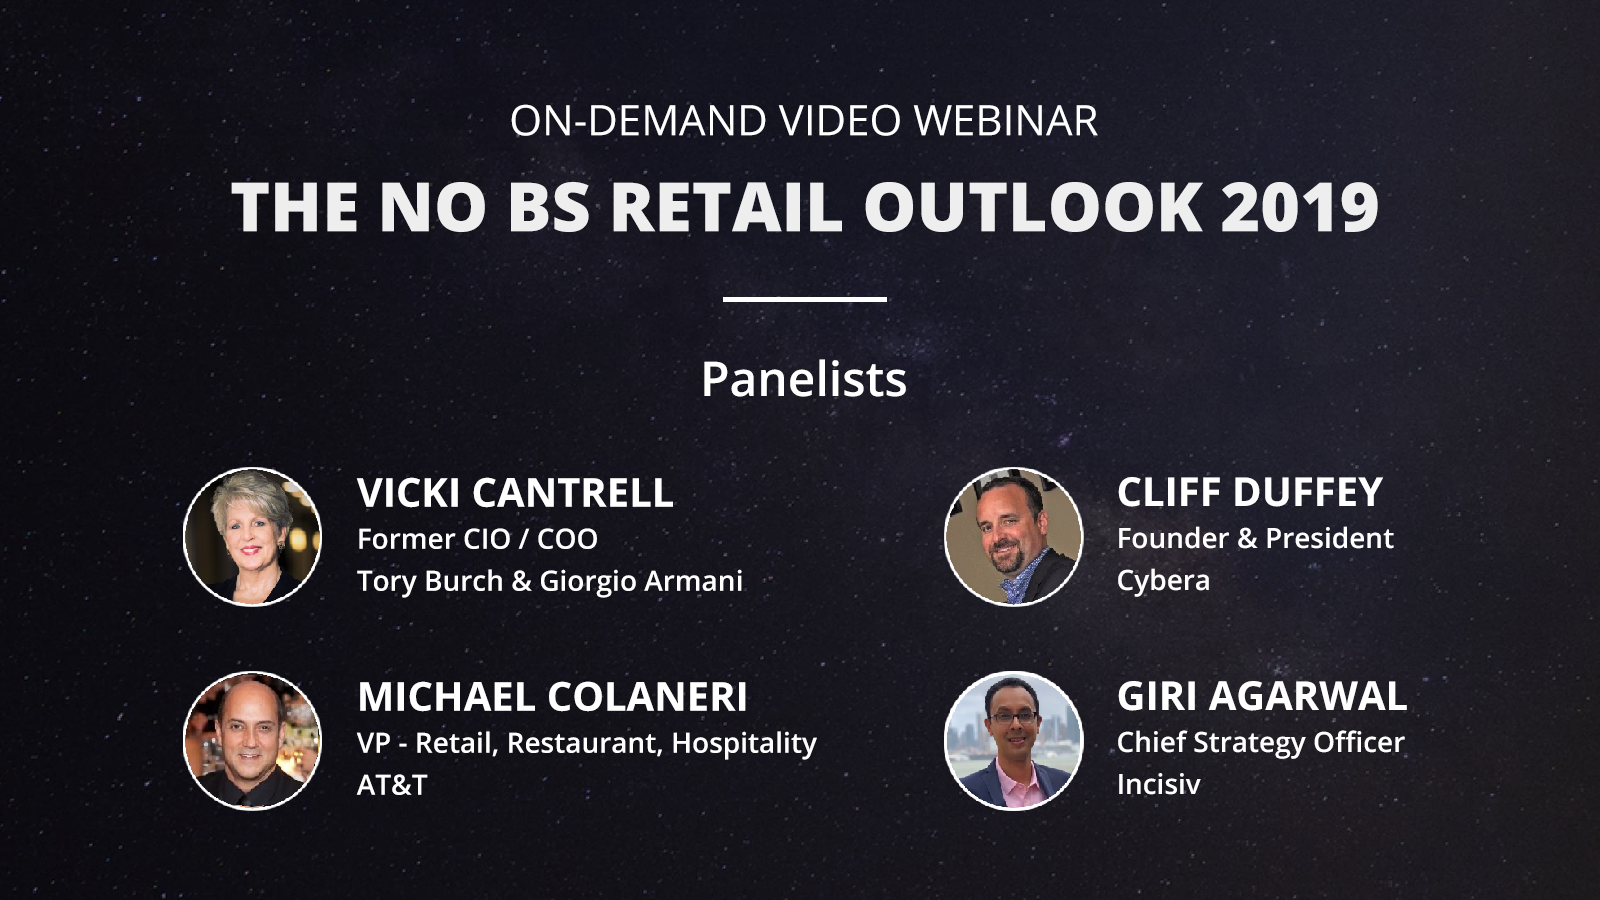 The No BS Retail Outlook 2019, Video Webinar, Incisiv, 31 Jan 2019